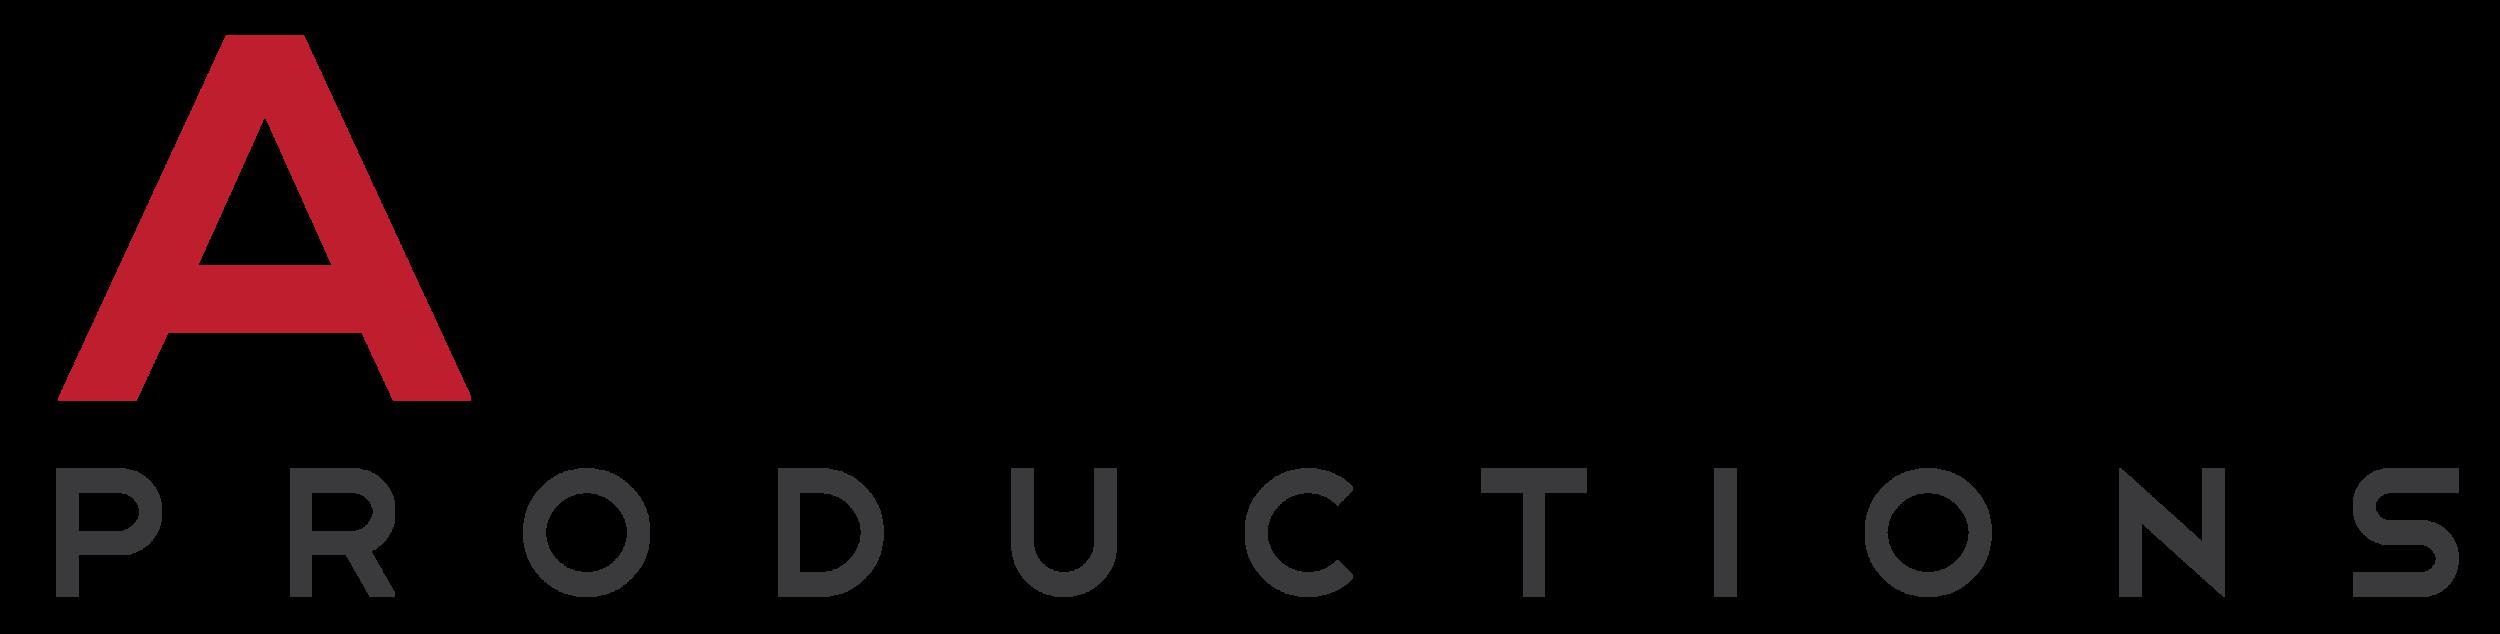 TITLE AVENIDA Productions-logo-01 copy.png